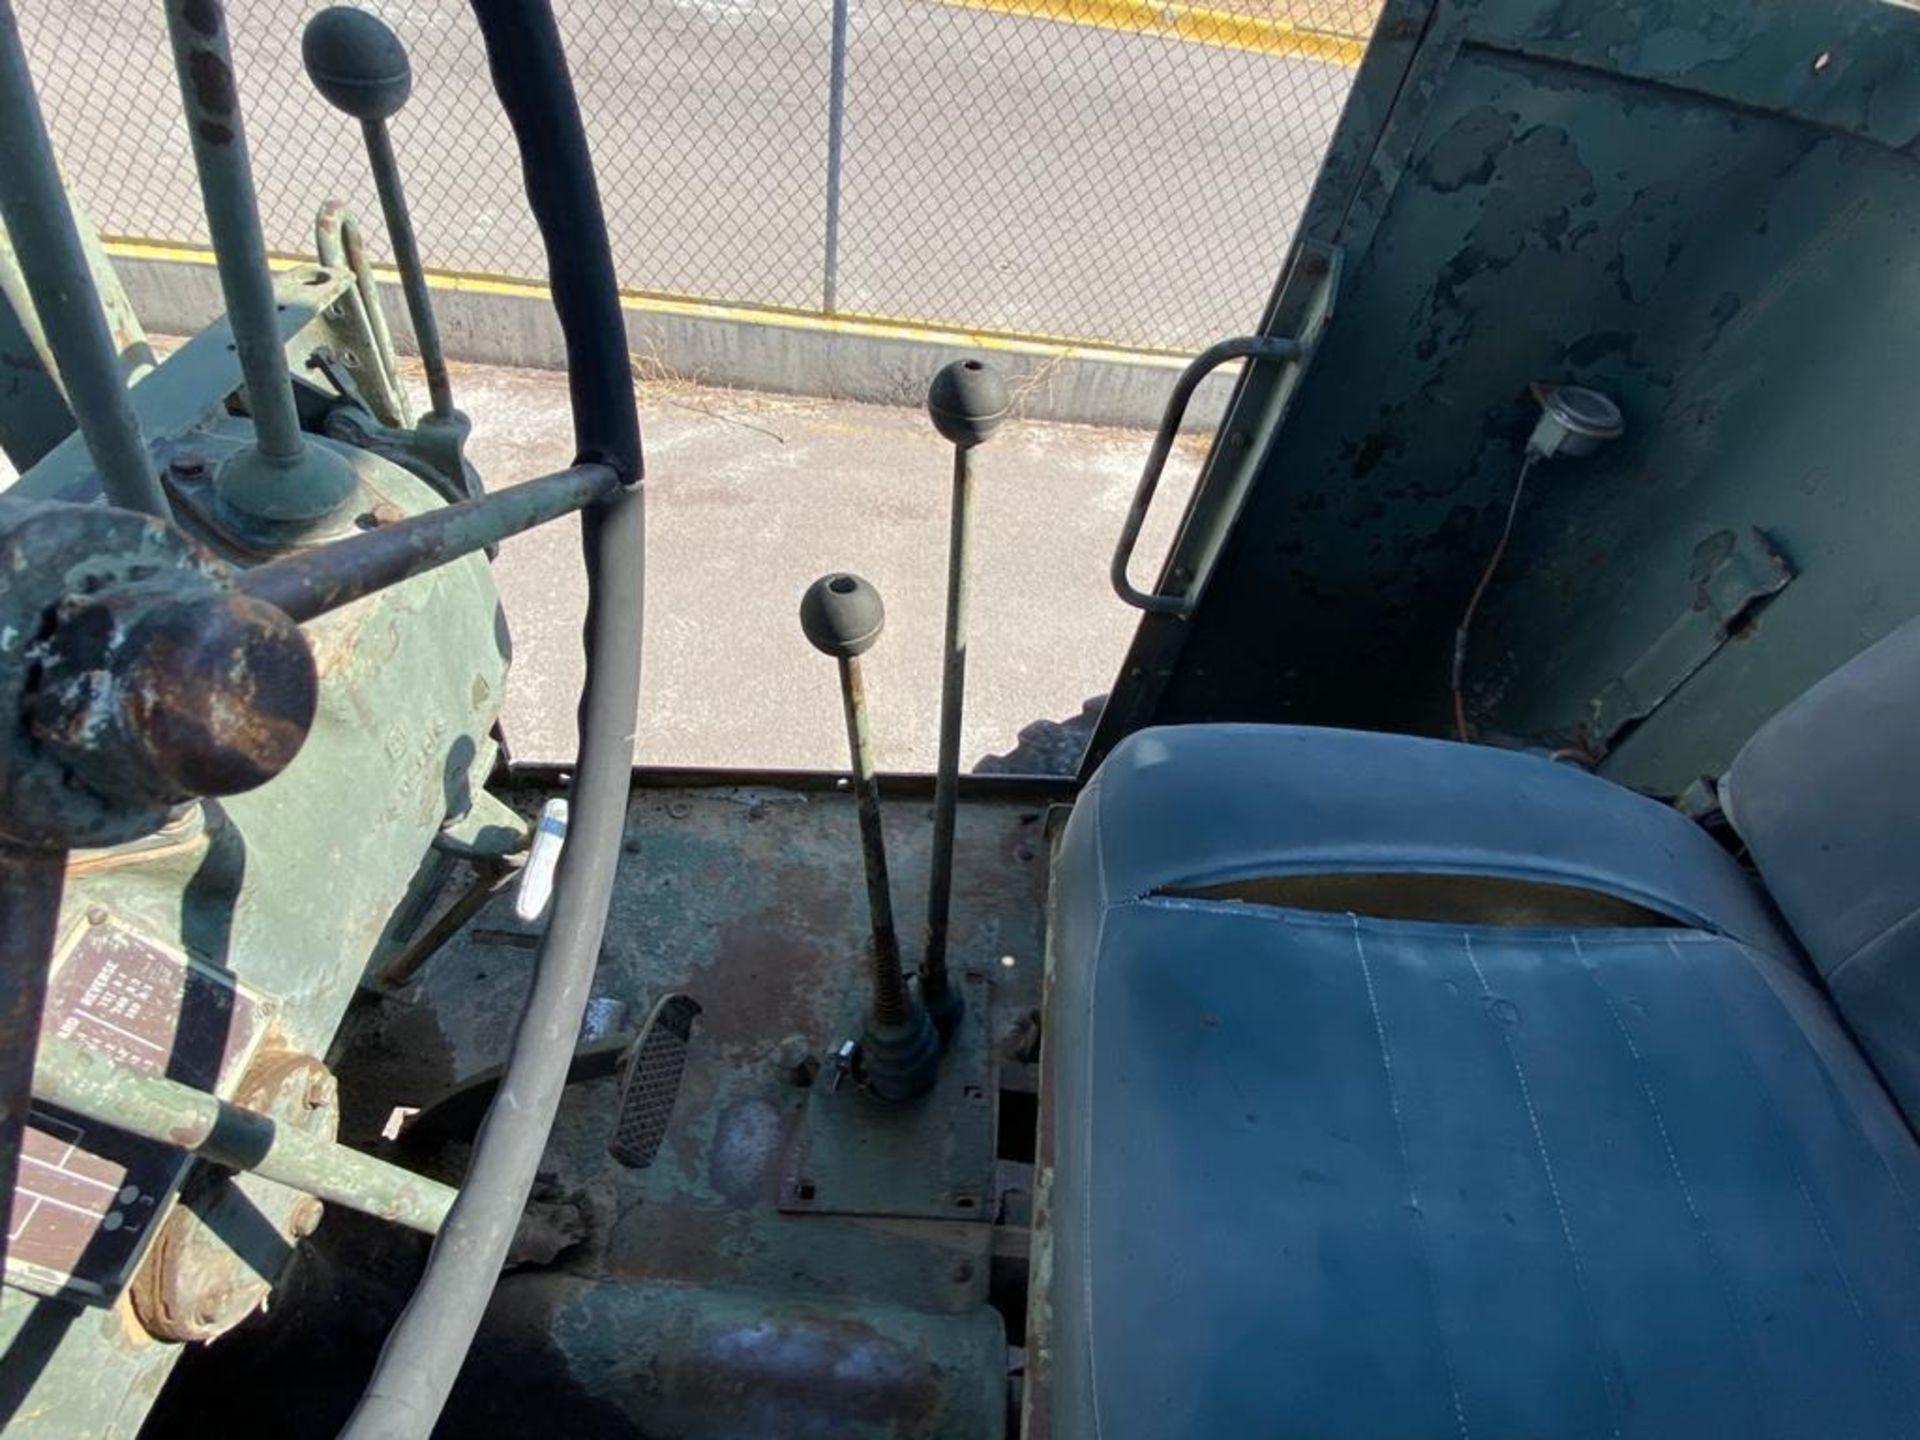 1970 Wabco4 440H Motor Grader, Serial number 440HAGM1398, Motor number 4A156316*RC*4057C - Image 49 of 77